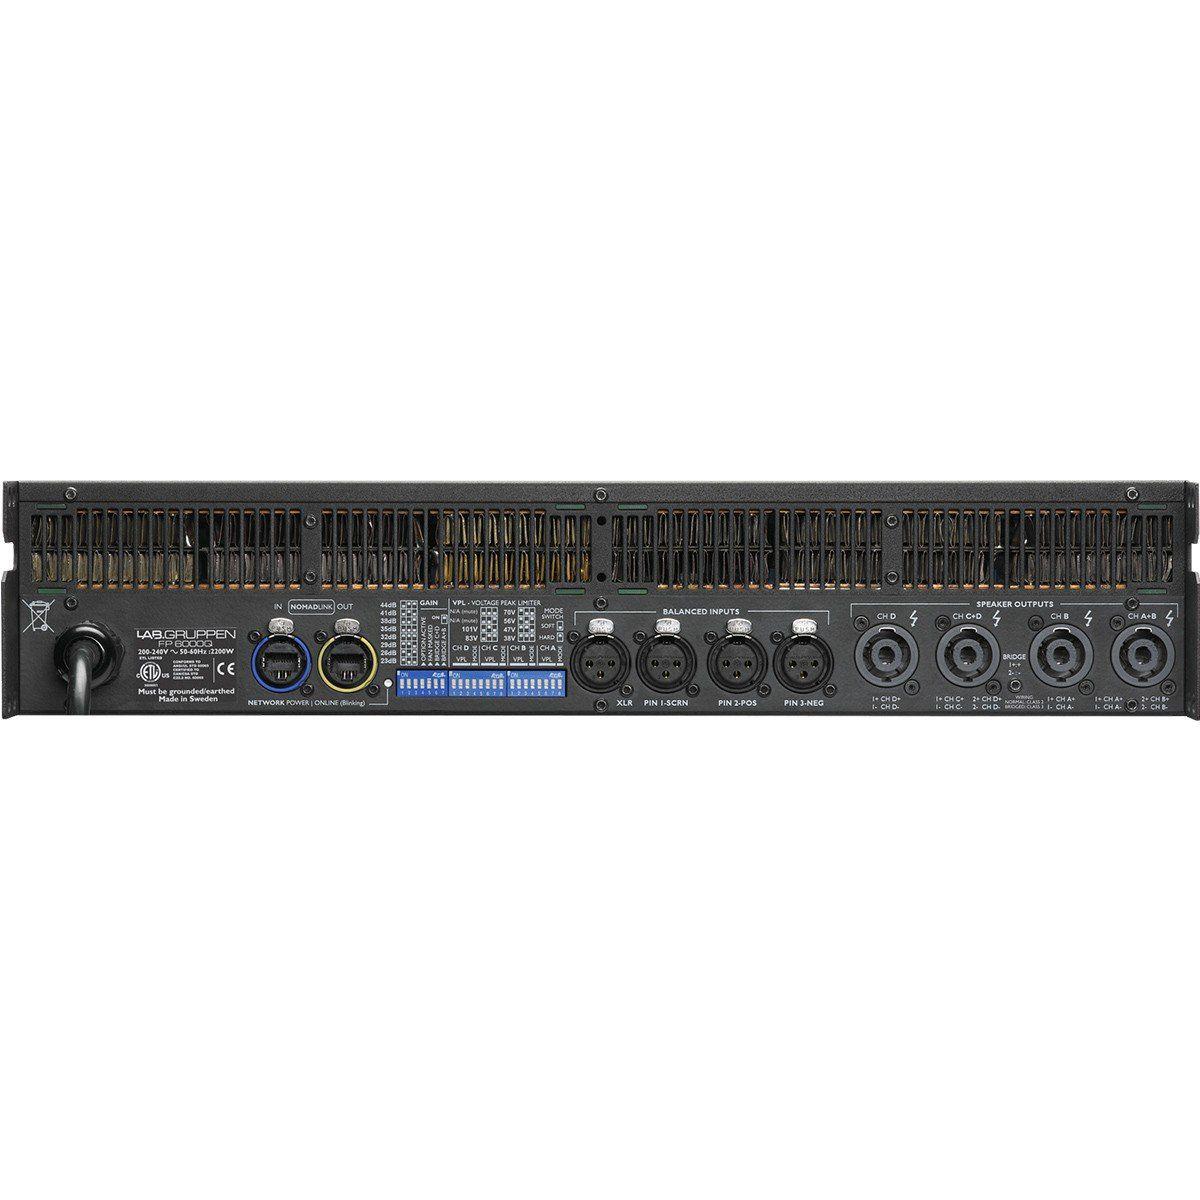 Lab Gruppen FP6000Q Amplificador Gruppen FP6000Q 4 Canais